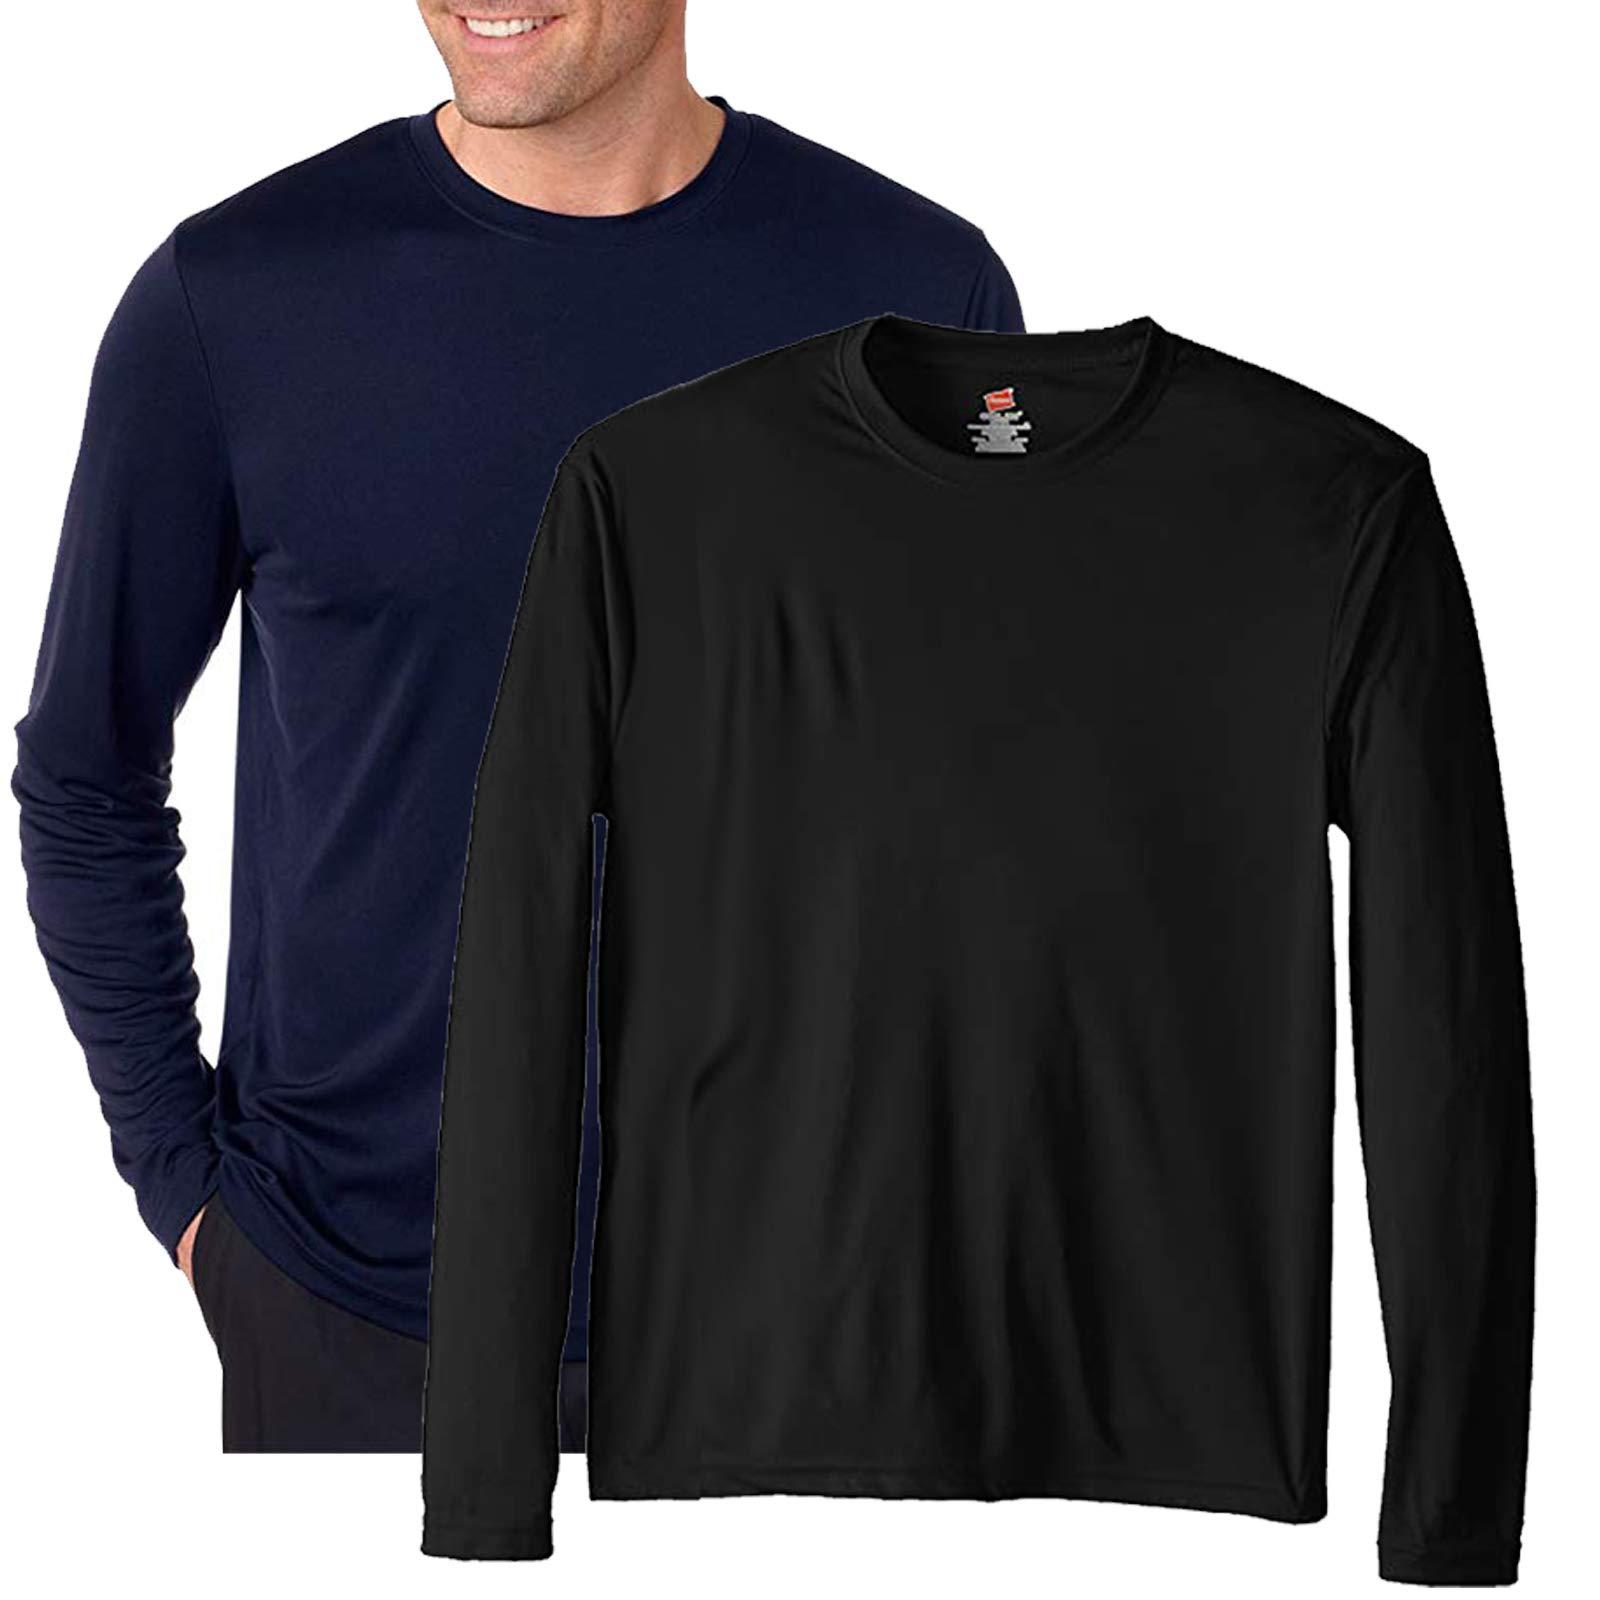 Hanes Performance Men's Long-Sleeve T-Shirt,Navy/Black,XS by Hanes (Image #1)